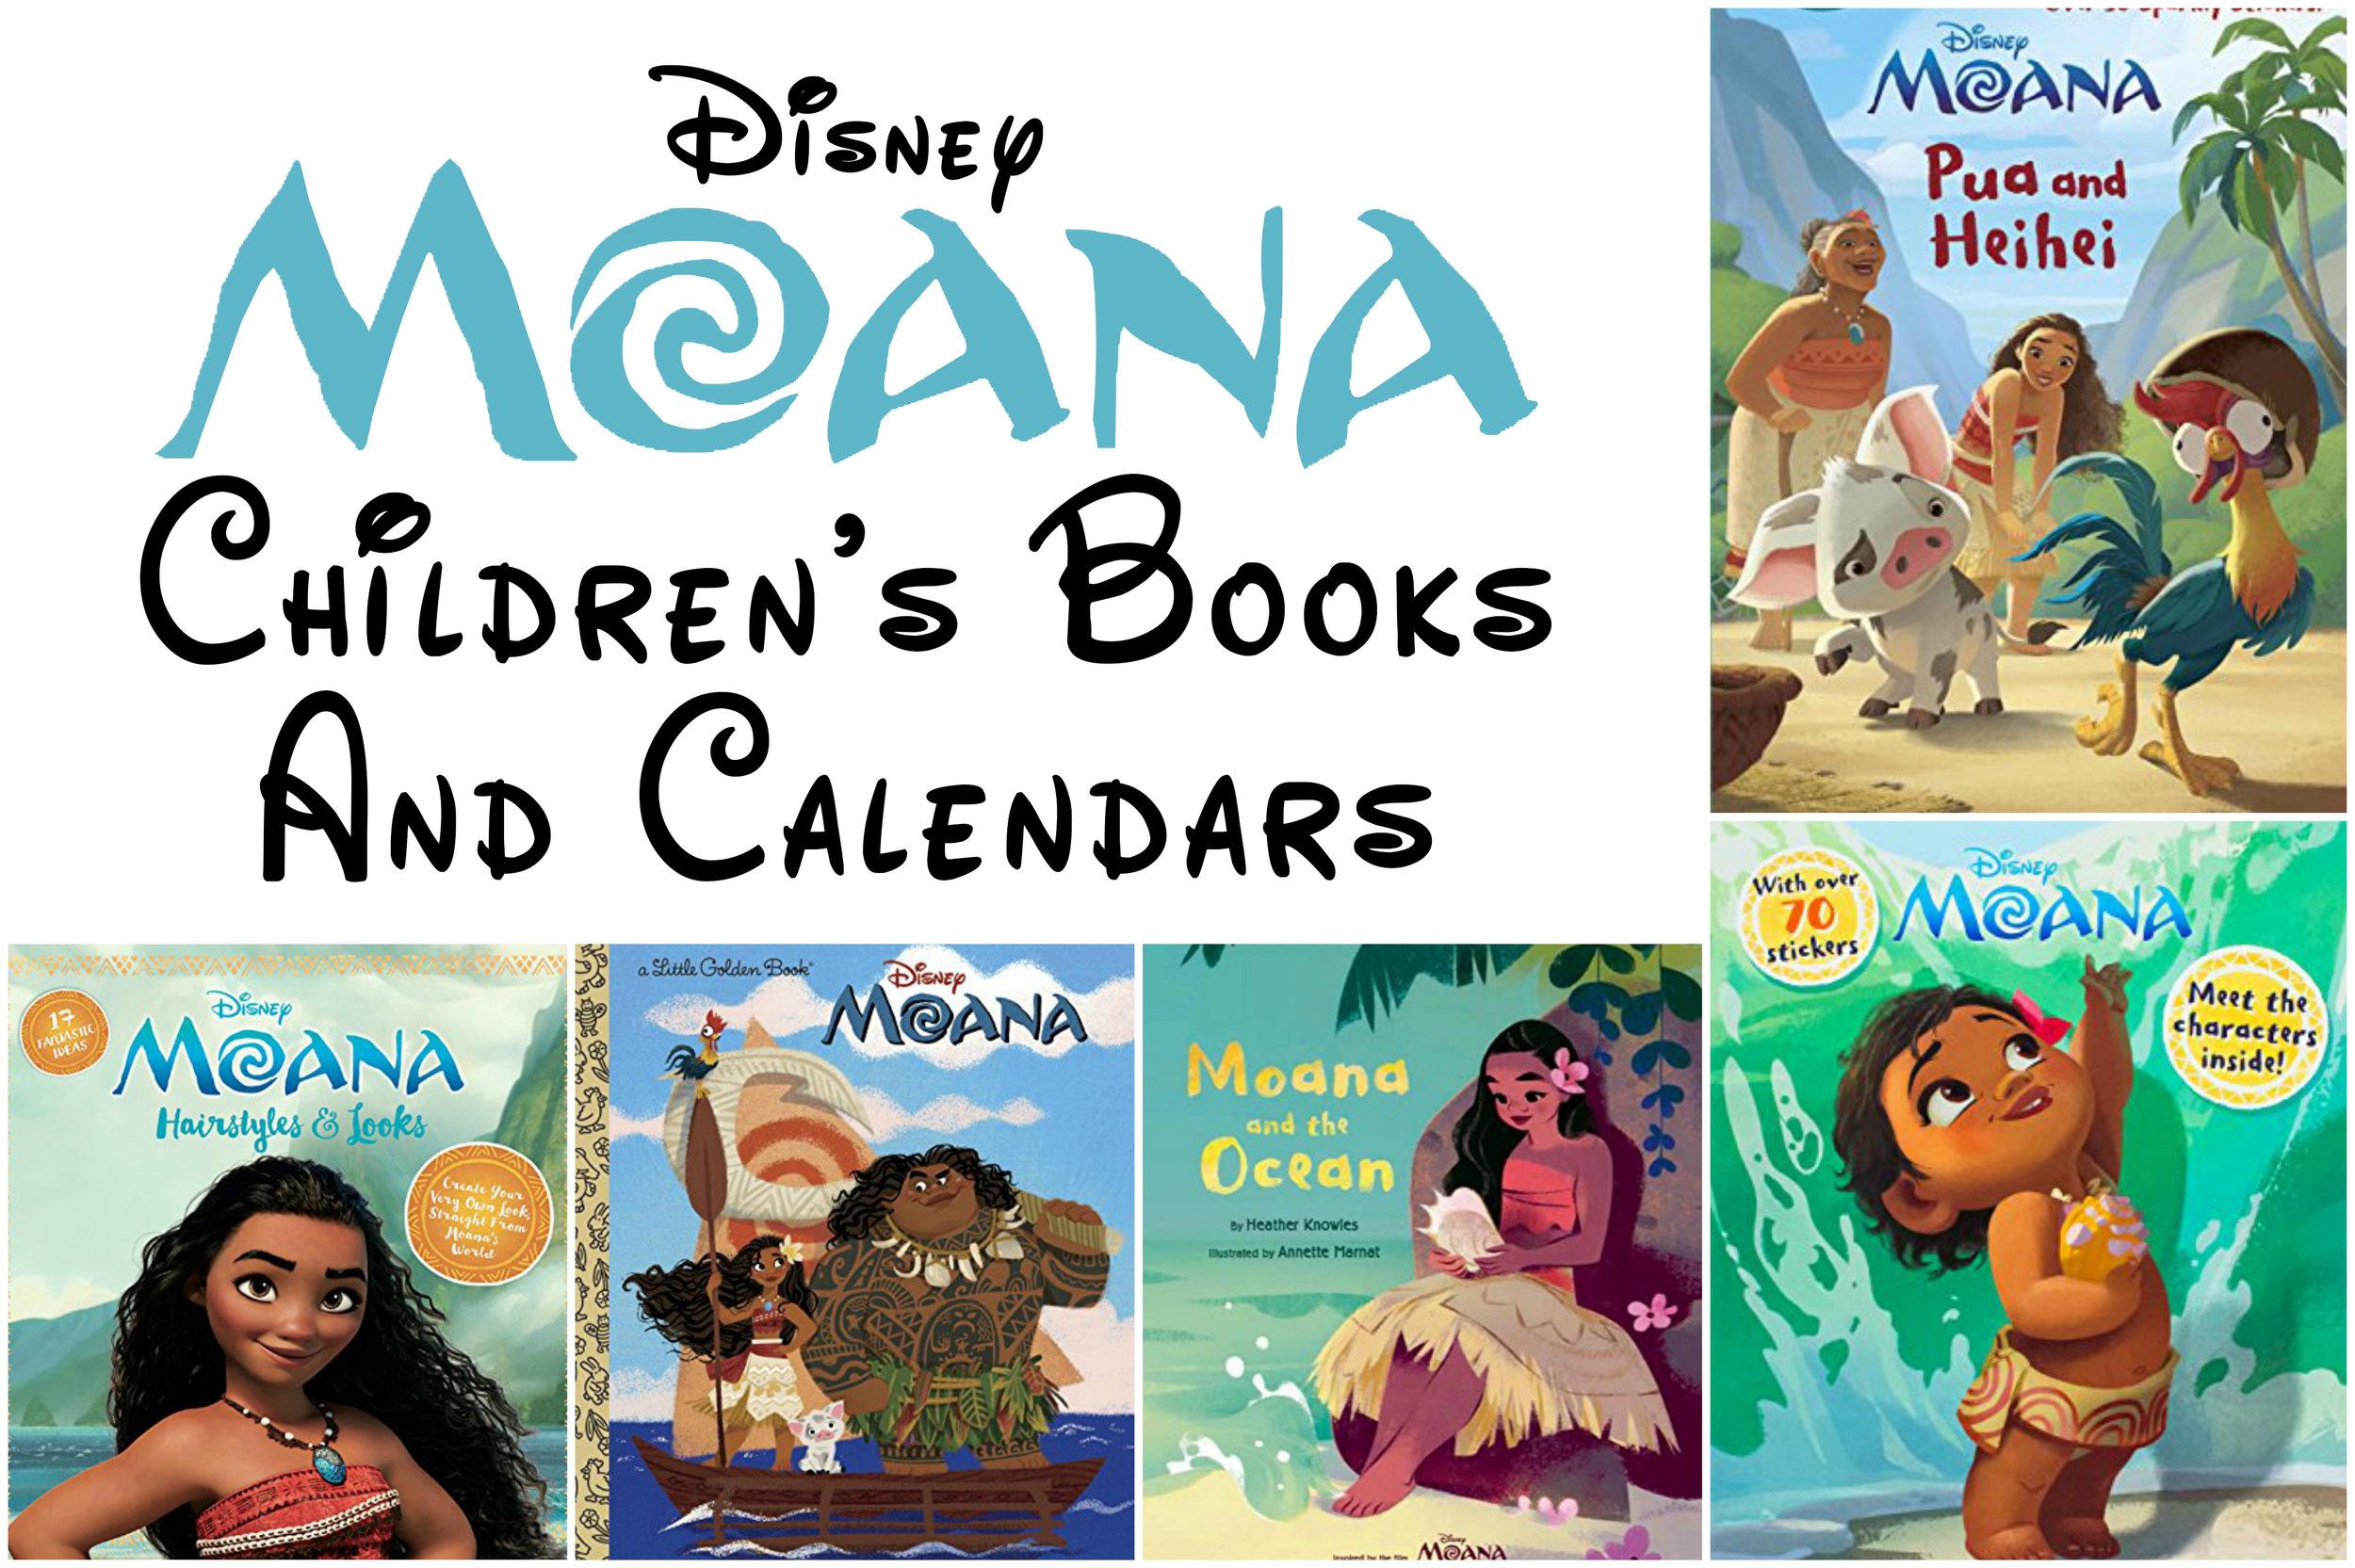 Disney Moana Childrens Books